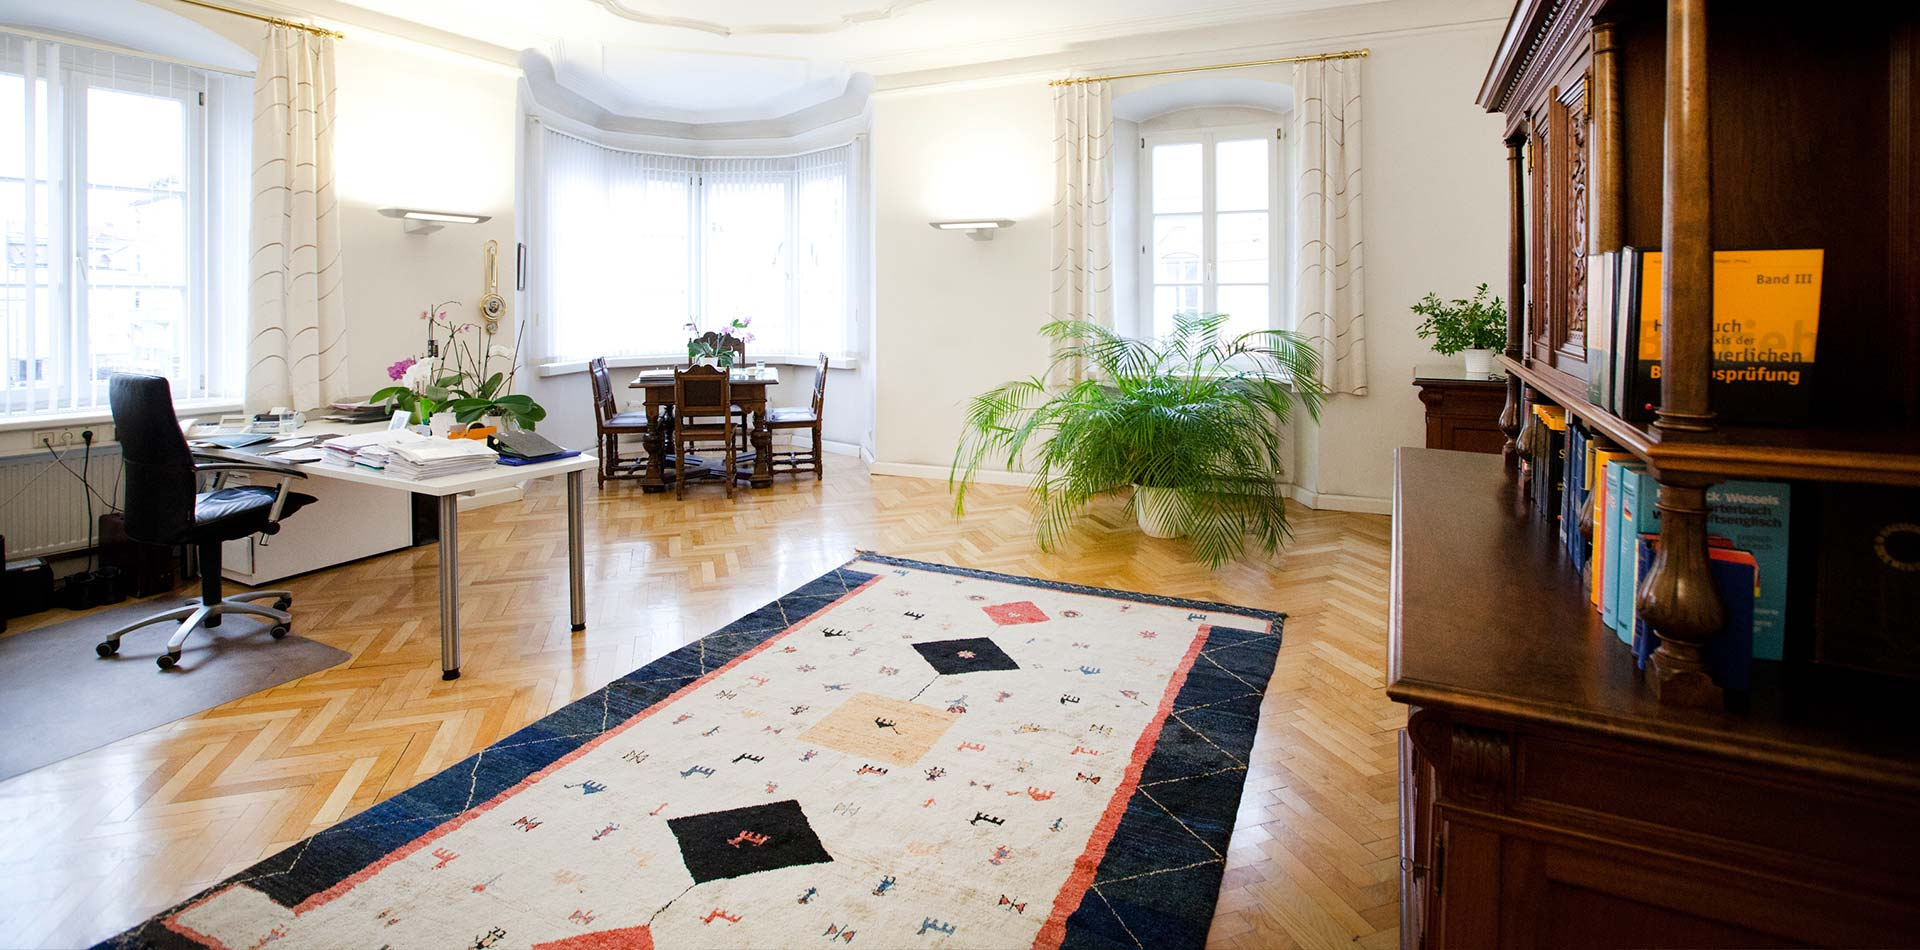 lohnverrechnung dr gasser steuerberatung kanzlei dr. Black Bedroom Furniture Sets. Home Design Ideas